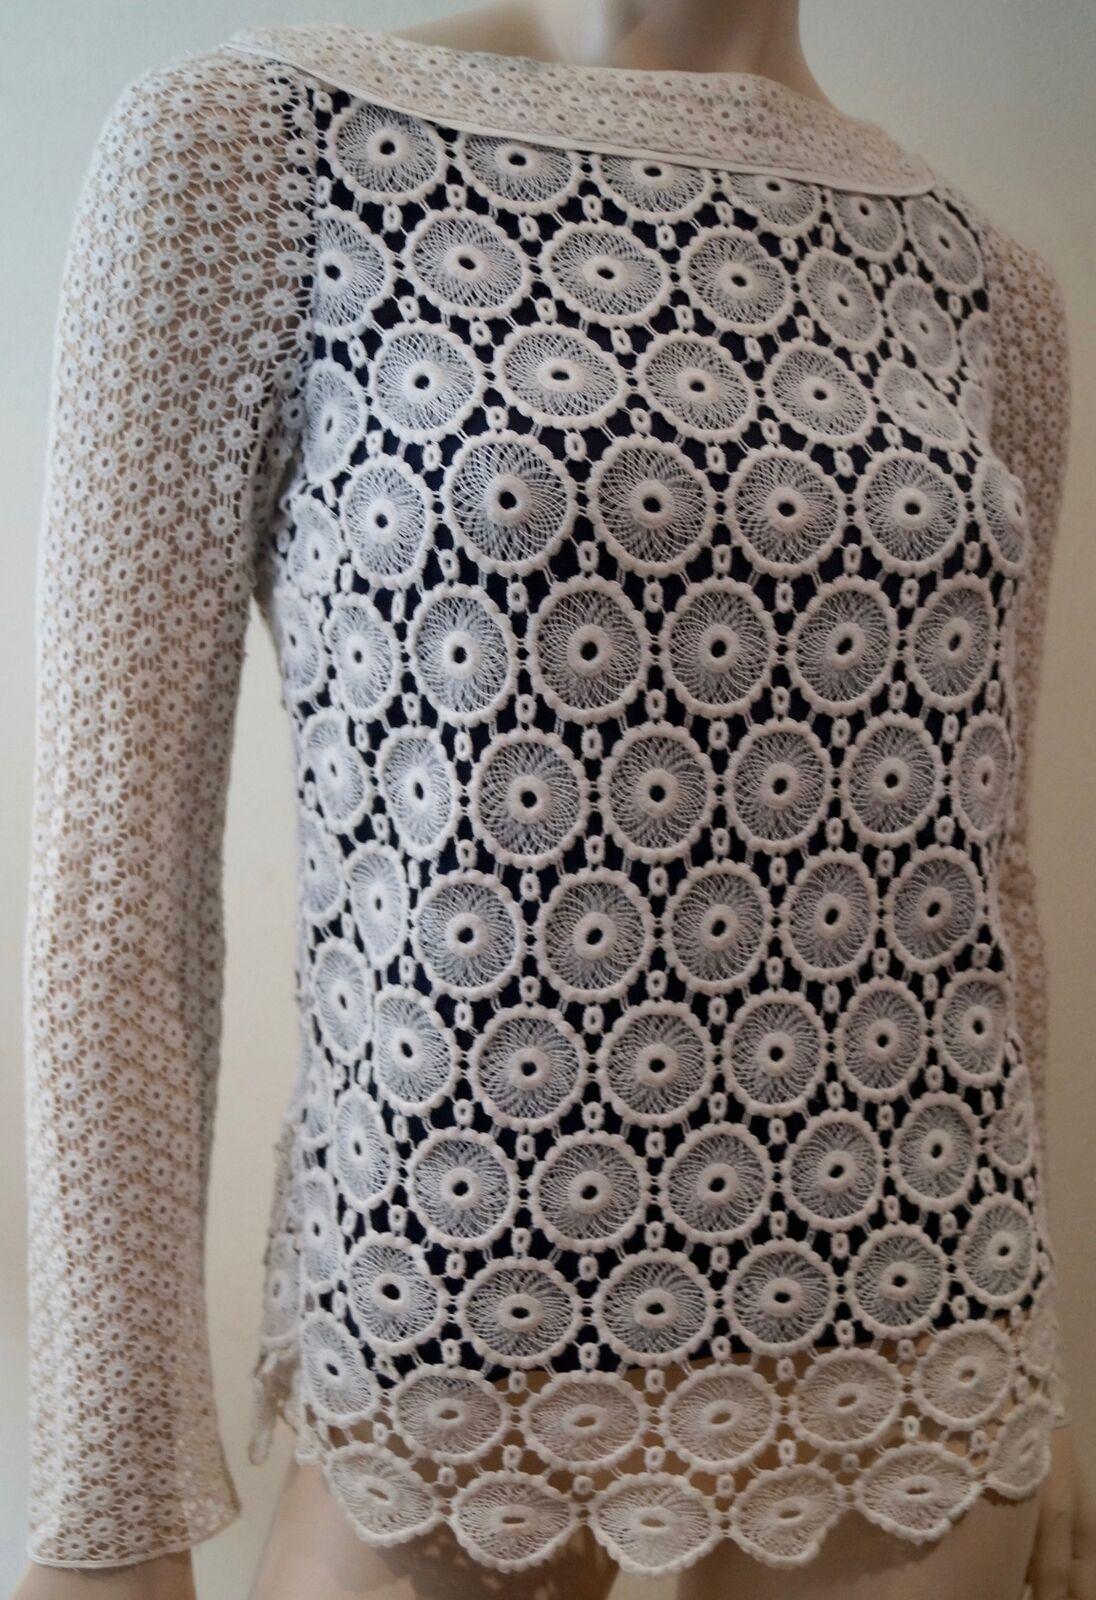 TORY BURCH schwarz Cream Crochet Cotton & Silk Round Neck Long Sleeve Top 2 UK6